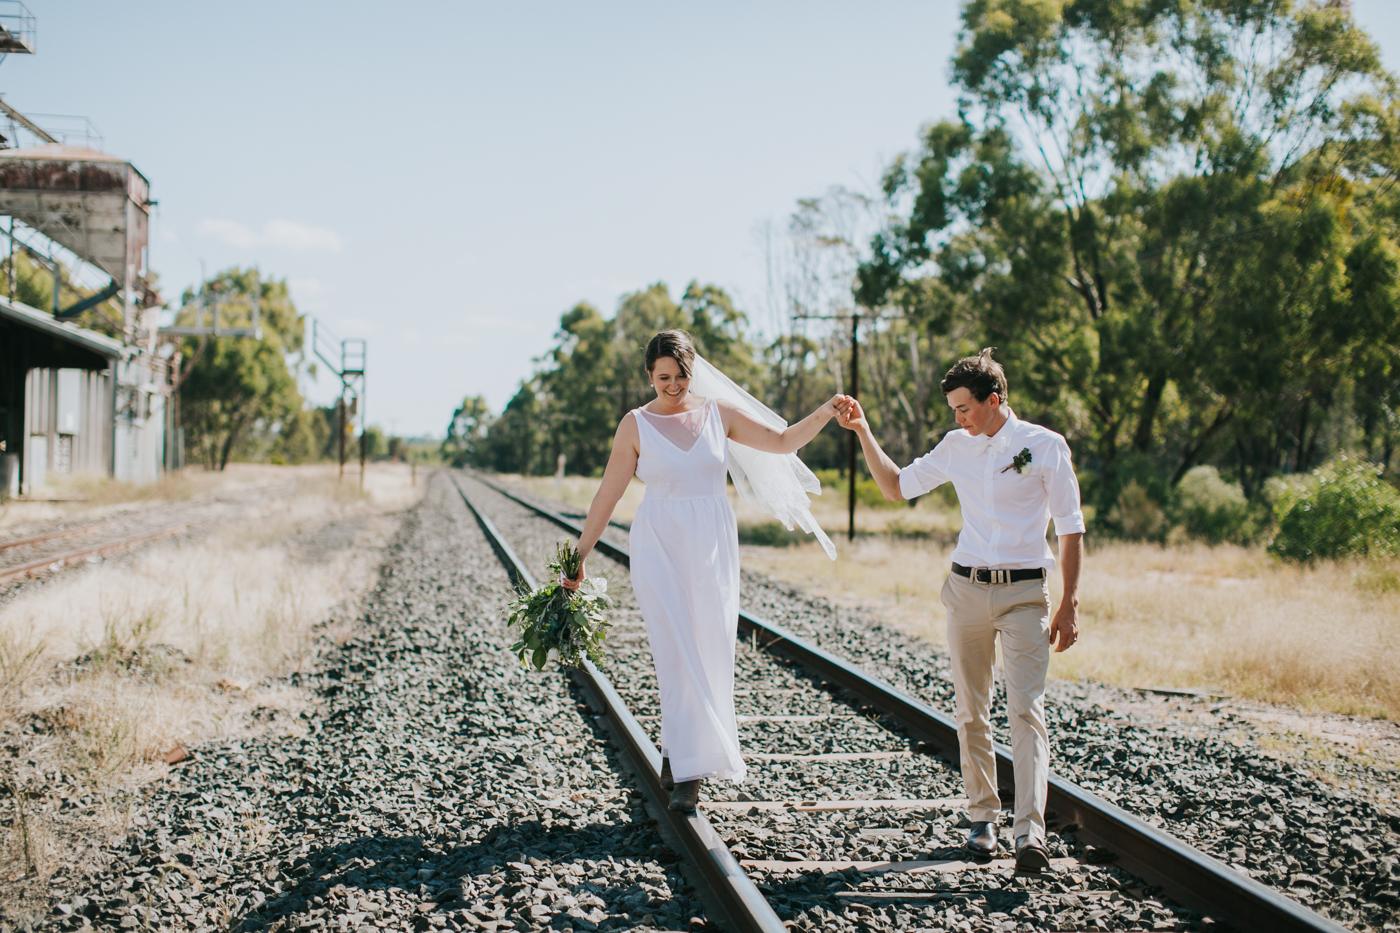 Nicolle & Jacob - Dubbo Wedding - Country Australia - Samantha Heather Photography-138.jpg